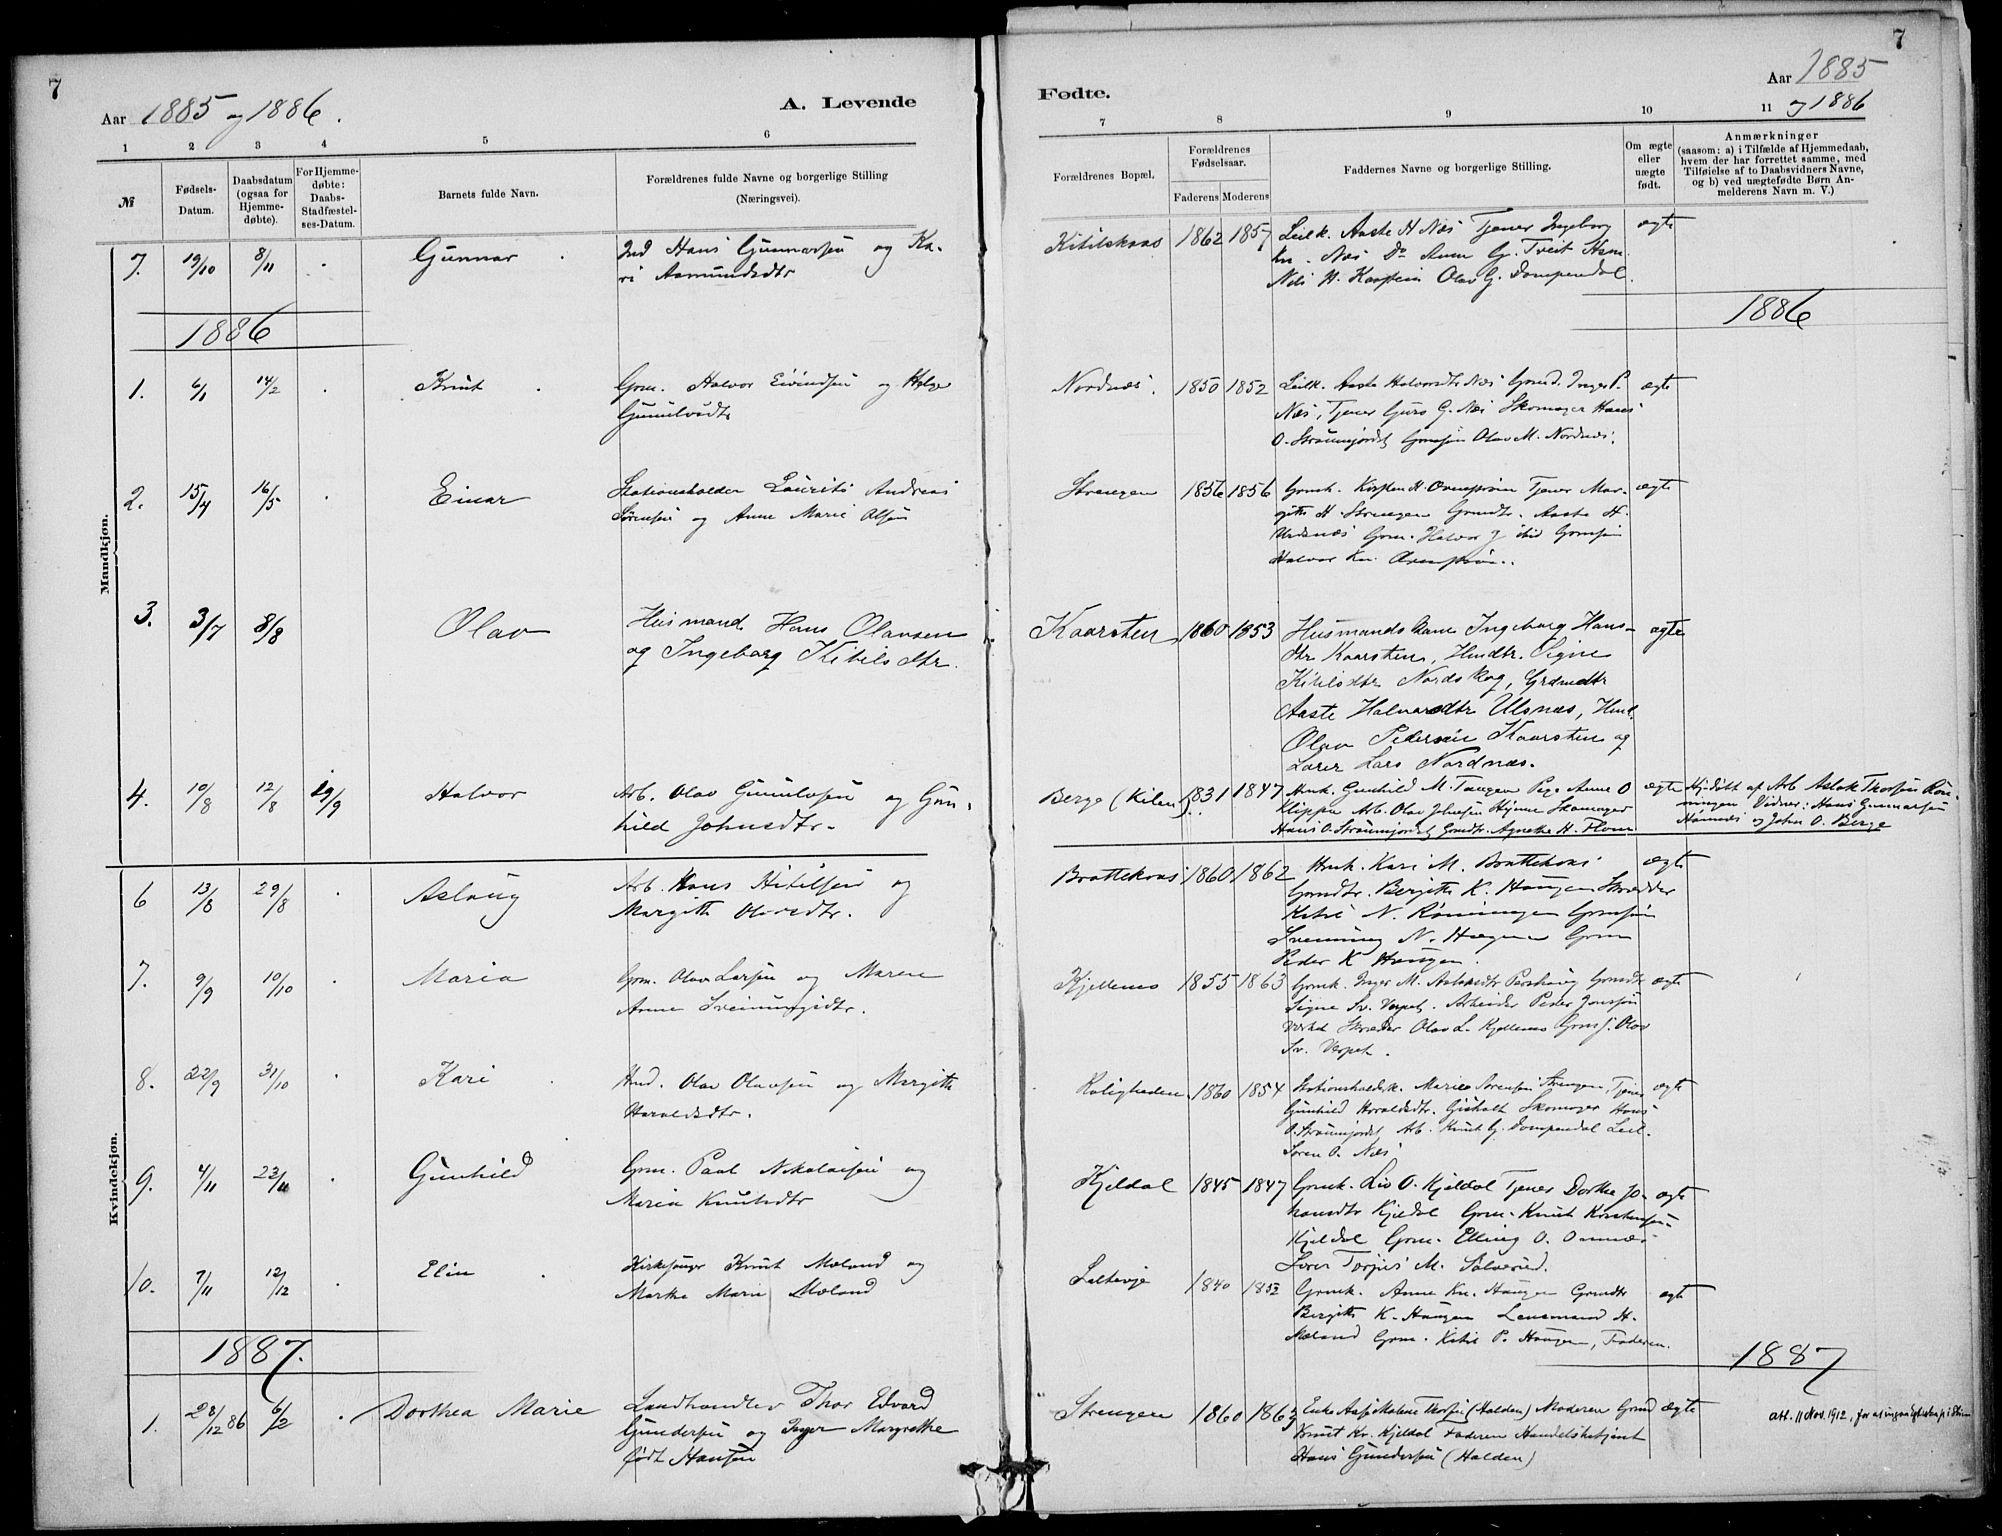 SAKO, Lunde kirkebøker, F/Fb/L0003: Ministerialbok nr. II 3, 1882-1891, s. 7